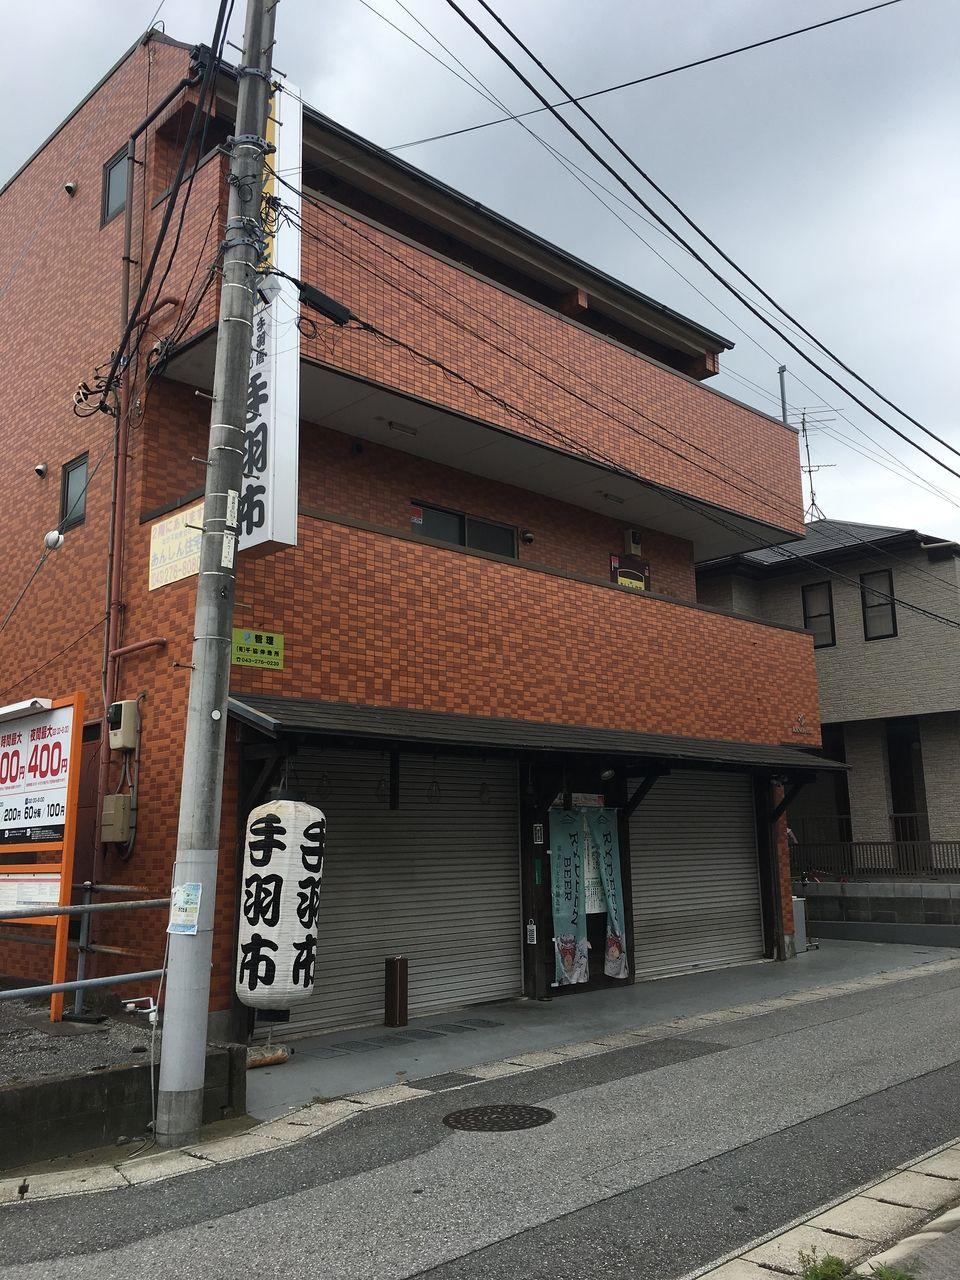 JR幕張本郷駅徒歩5分の駅近物件「カノアビル」です。